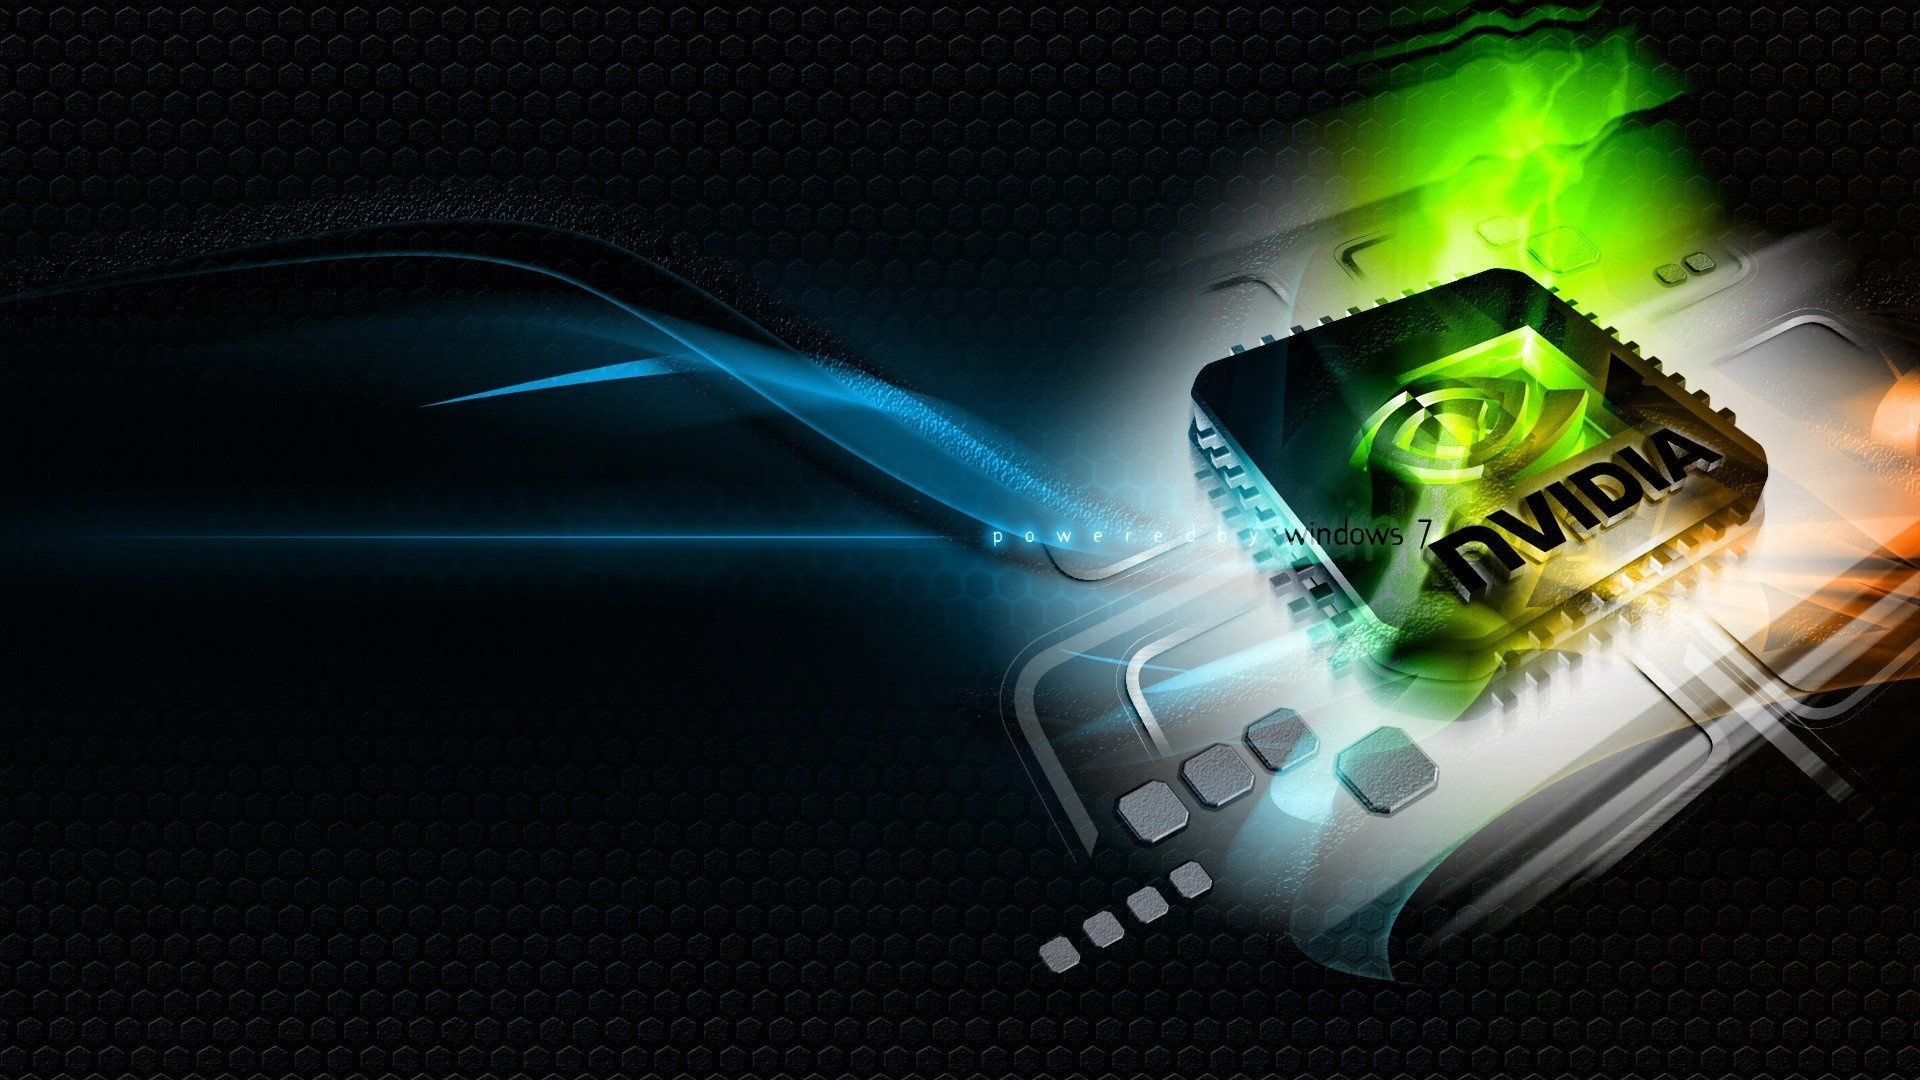 Alienware nvidia intel desktop wallpapers top free - 1920x1080 wallpaper nvidia ...